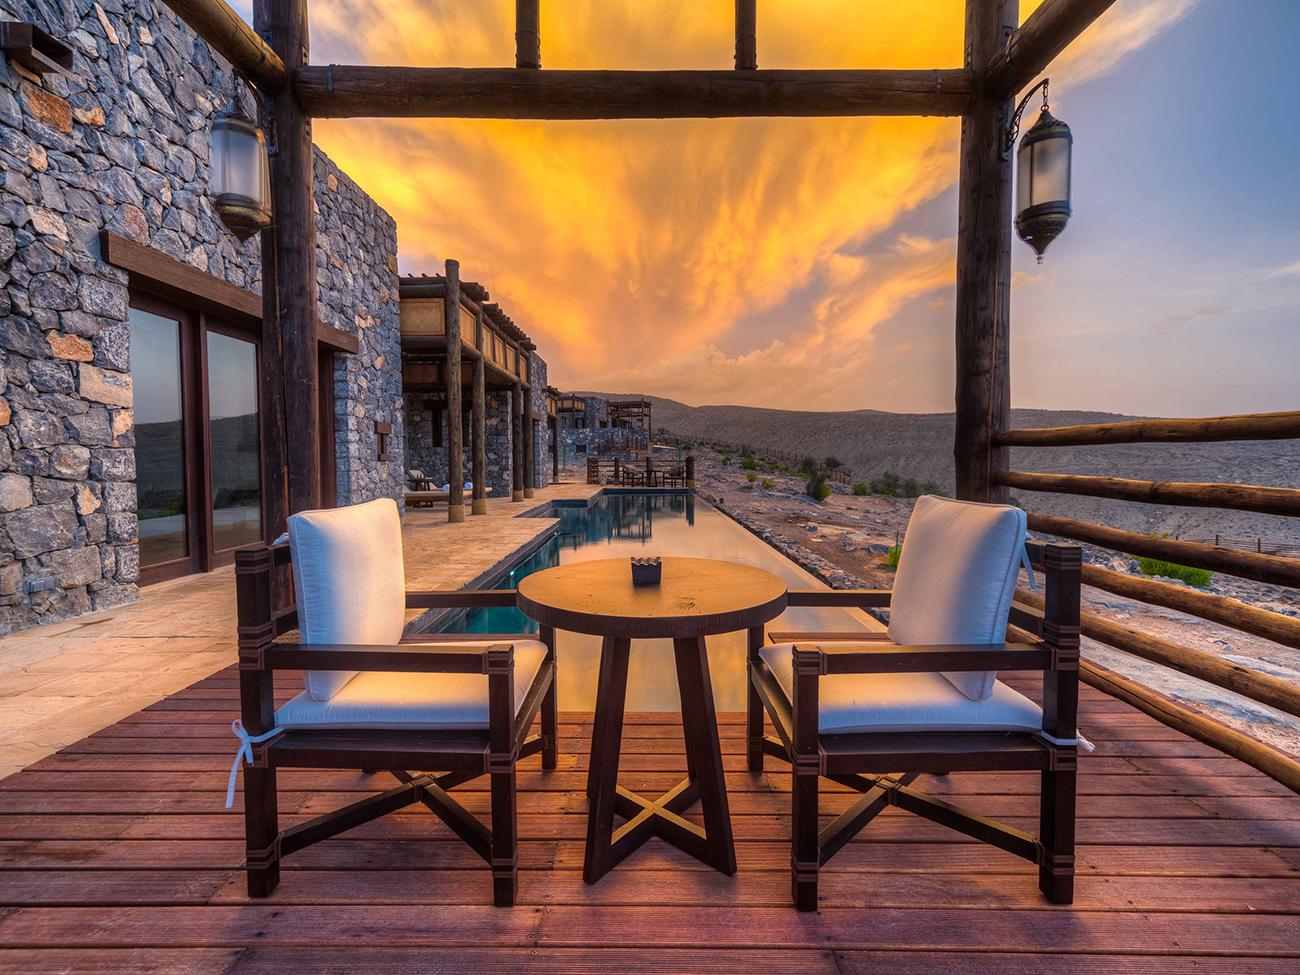 Oman's Mountain Escape: The Alila Jabal Akhdar Resort